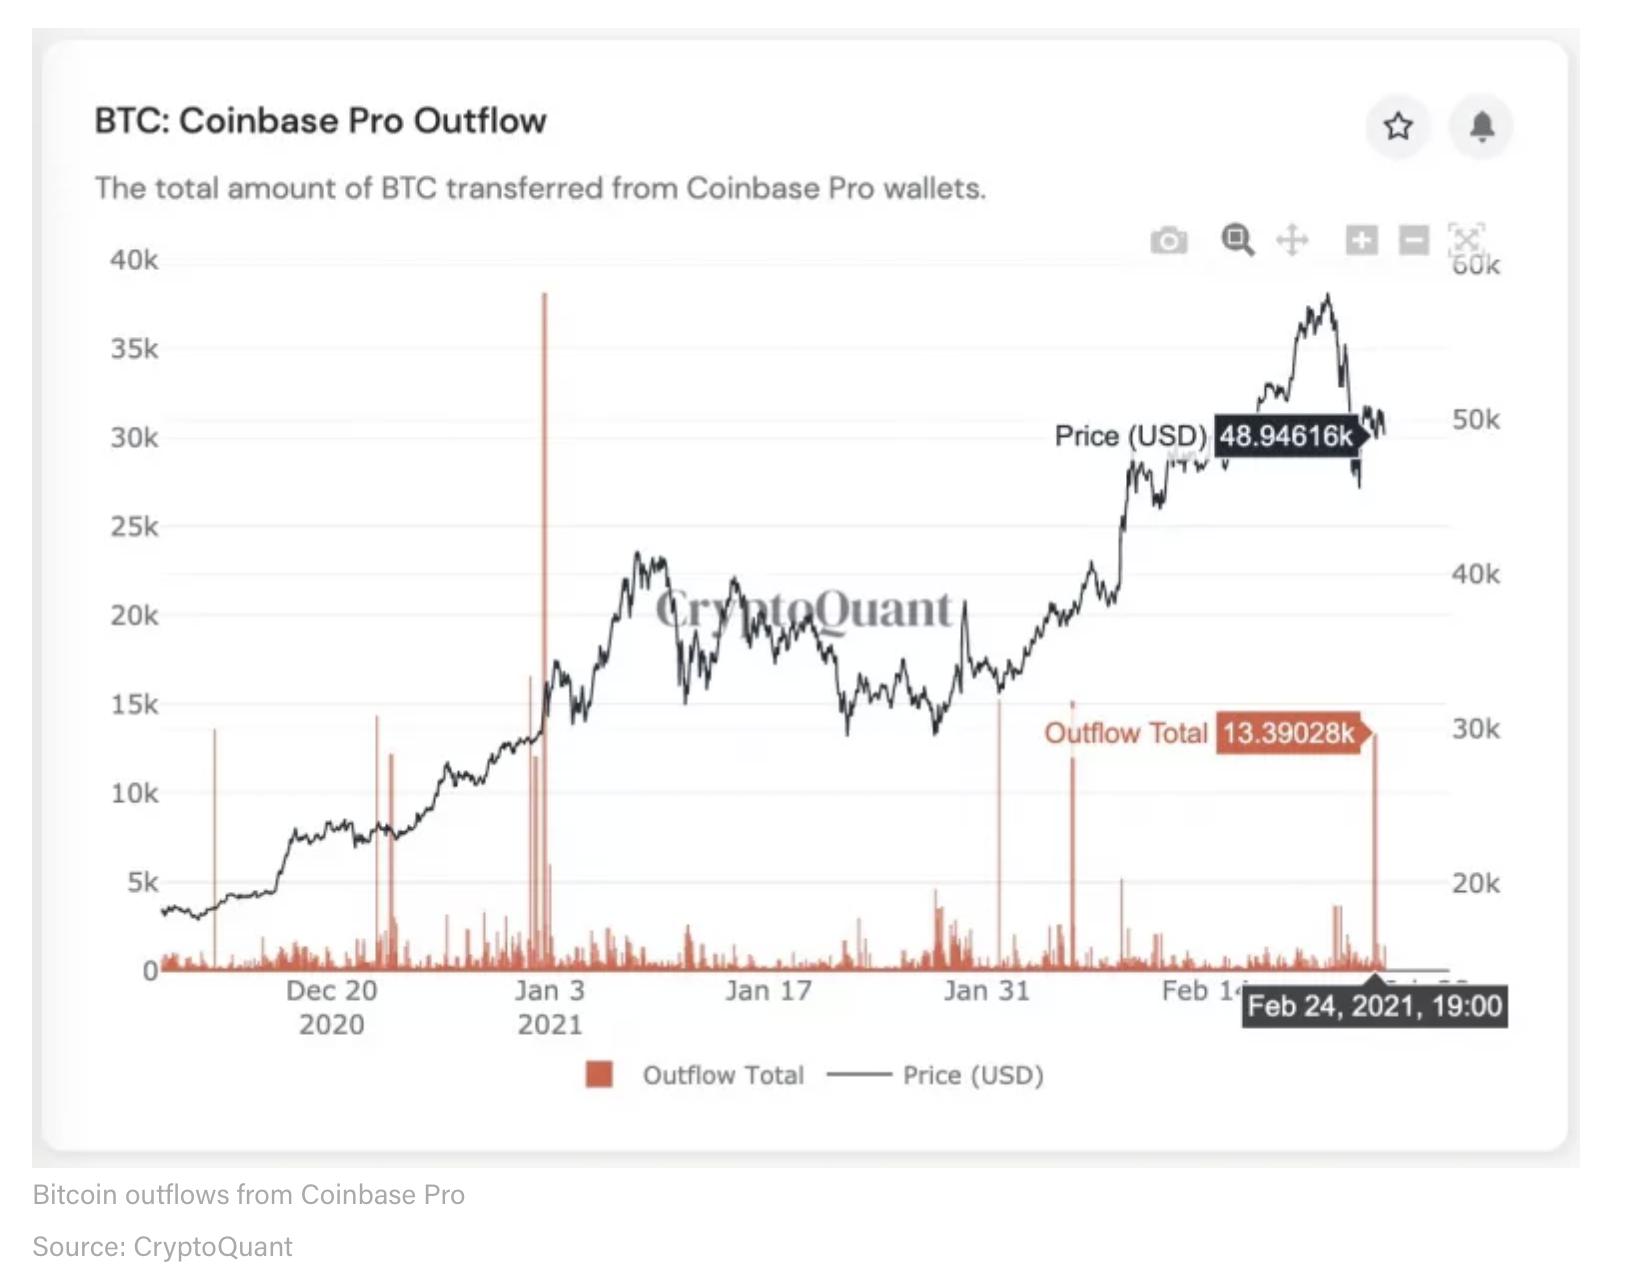 BTC: Coinbase Pro Outflow